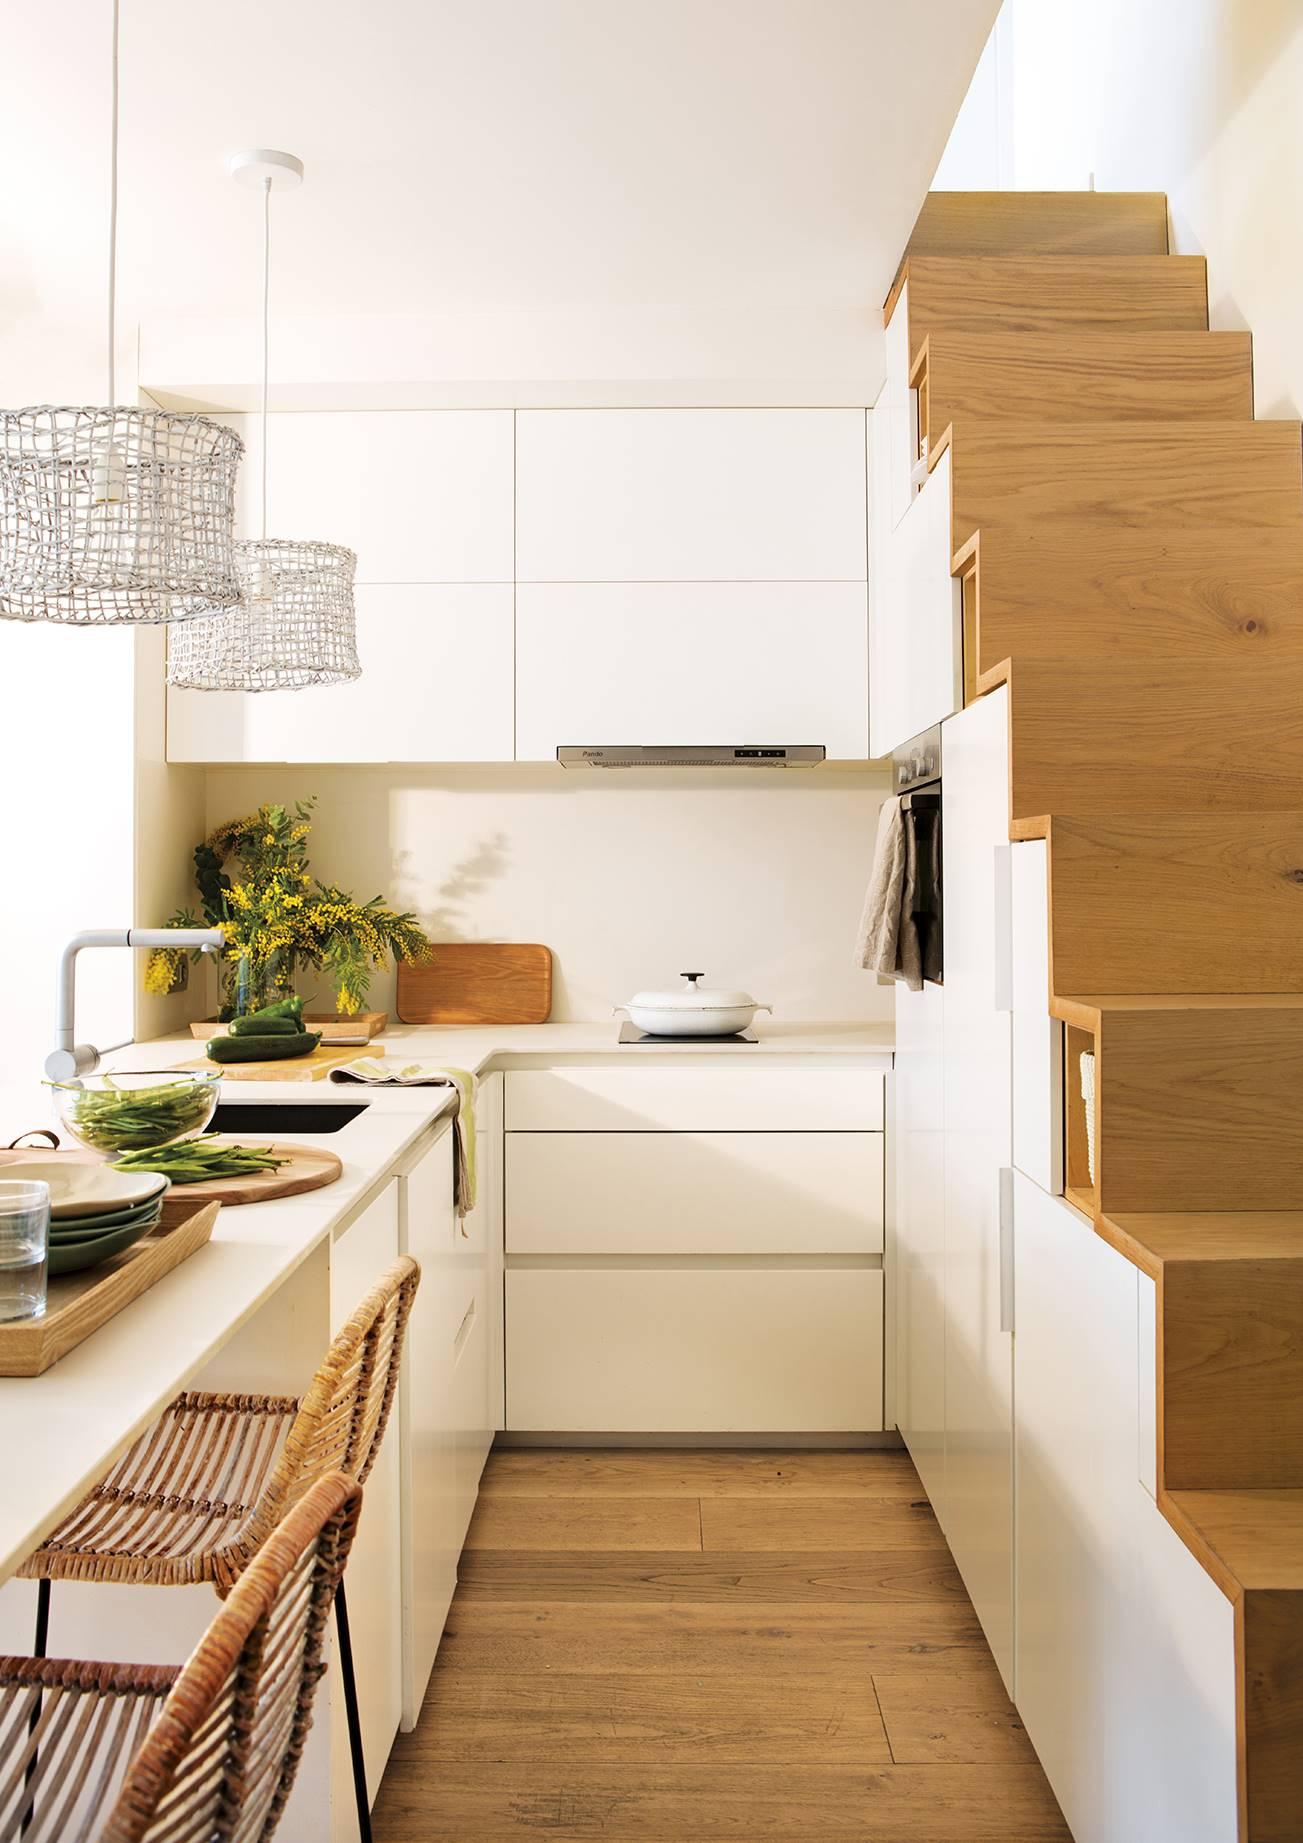 duplex 40 m2 cocina. Convivencia pacífica